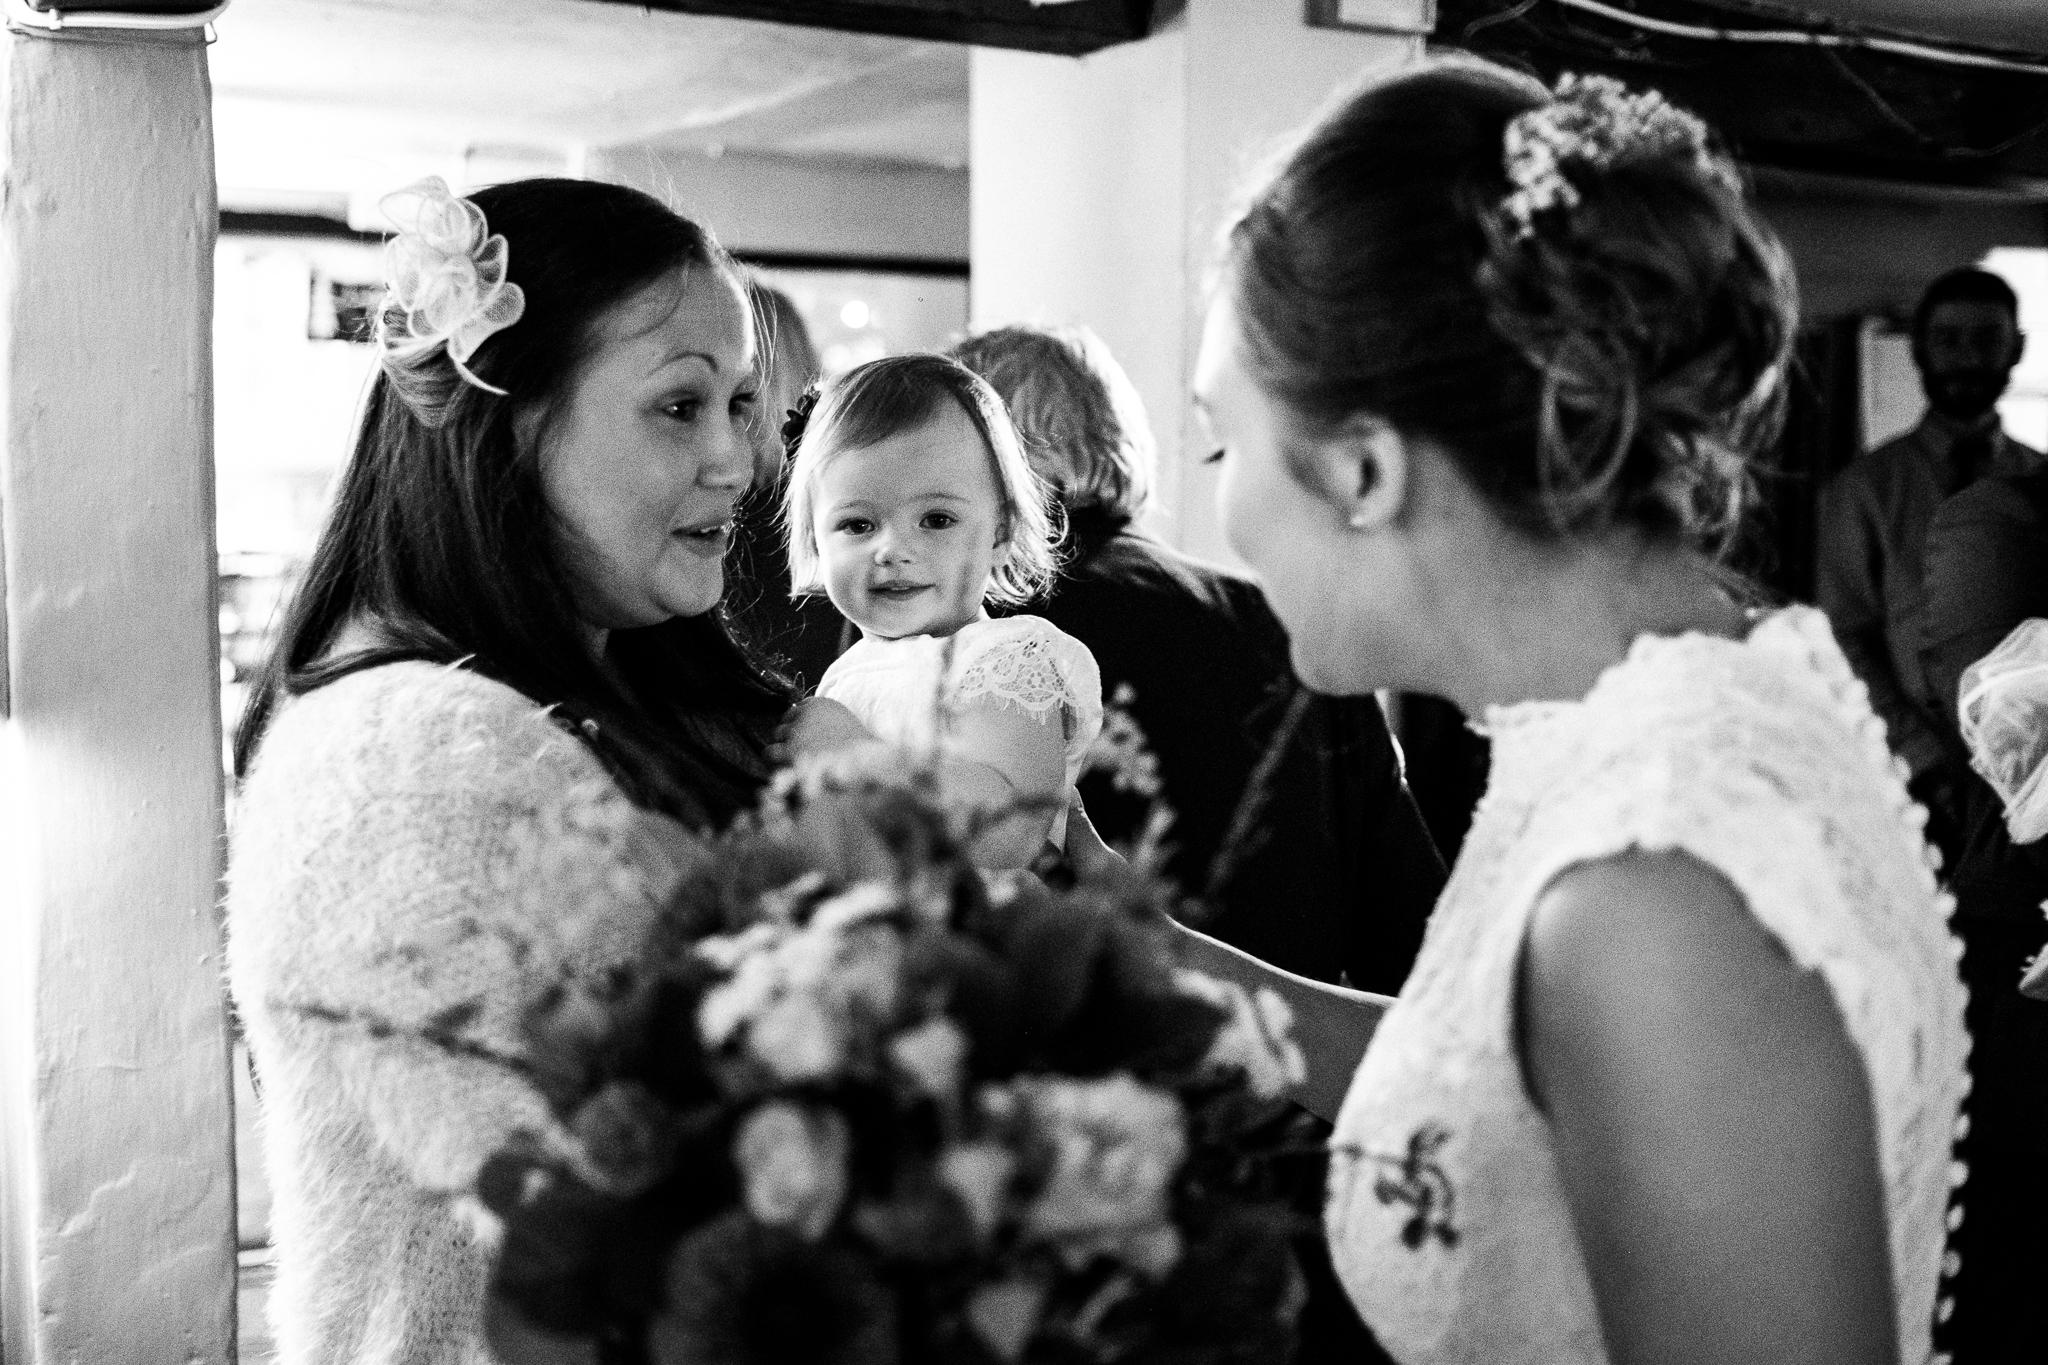 Relaxed Documentary Wedding Photography at The Wizard Inn, Alderley Edge Cheshire - Jenny Harper-38.jpg